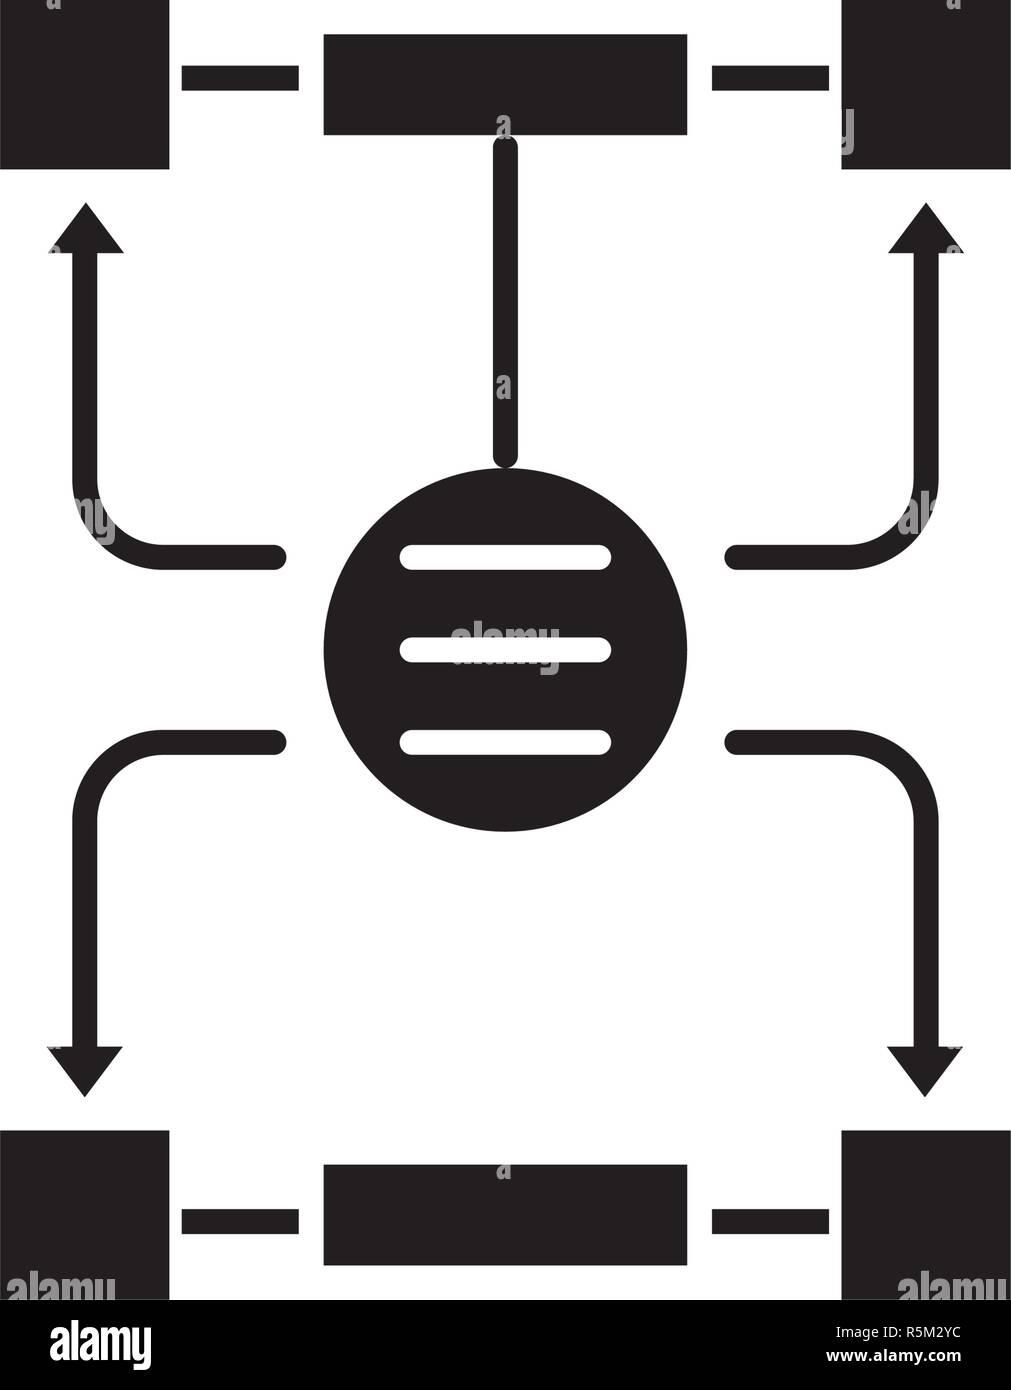 Algorithm of decisions black icon, vector sign on isolated background. Algorithm of decisions concept symbol, illustration  Stock Vector